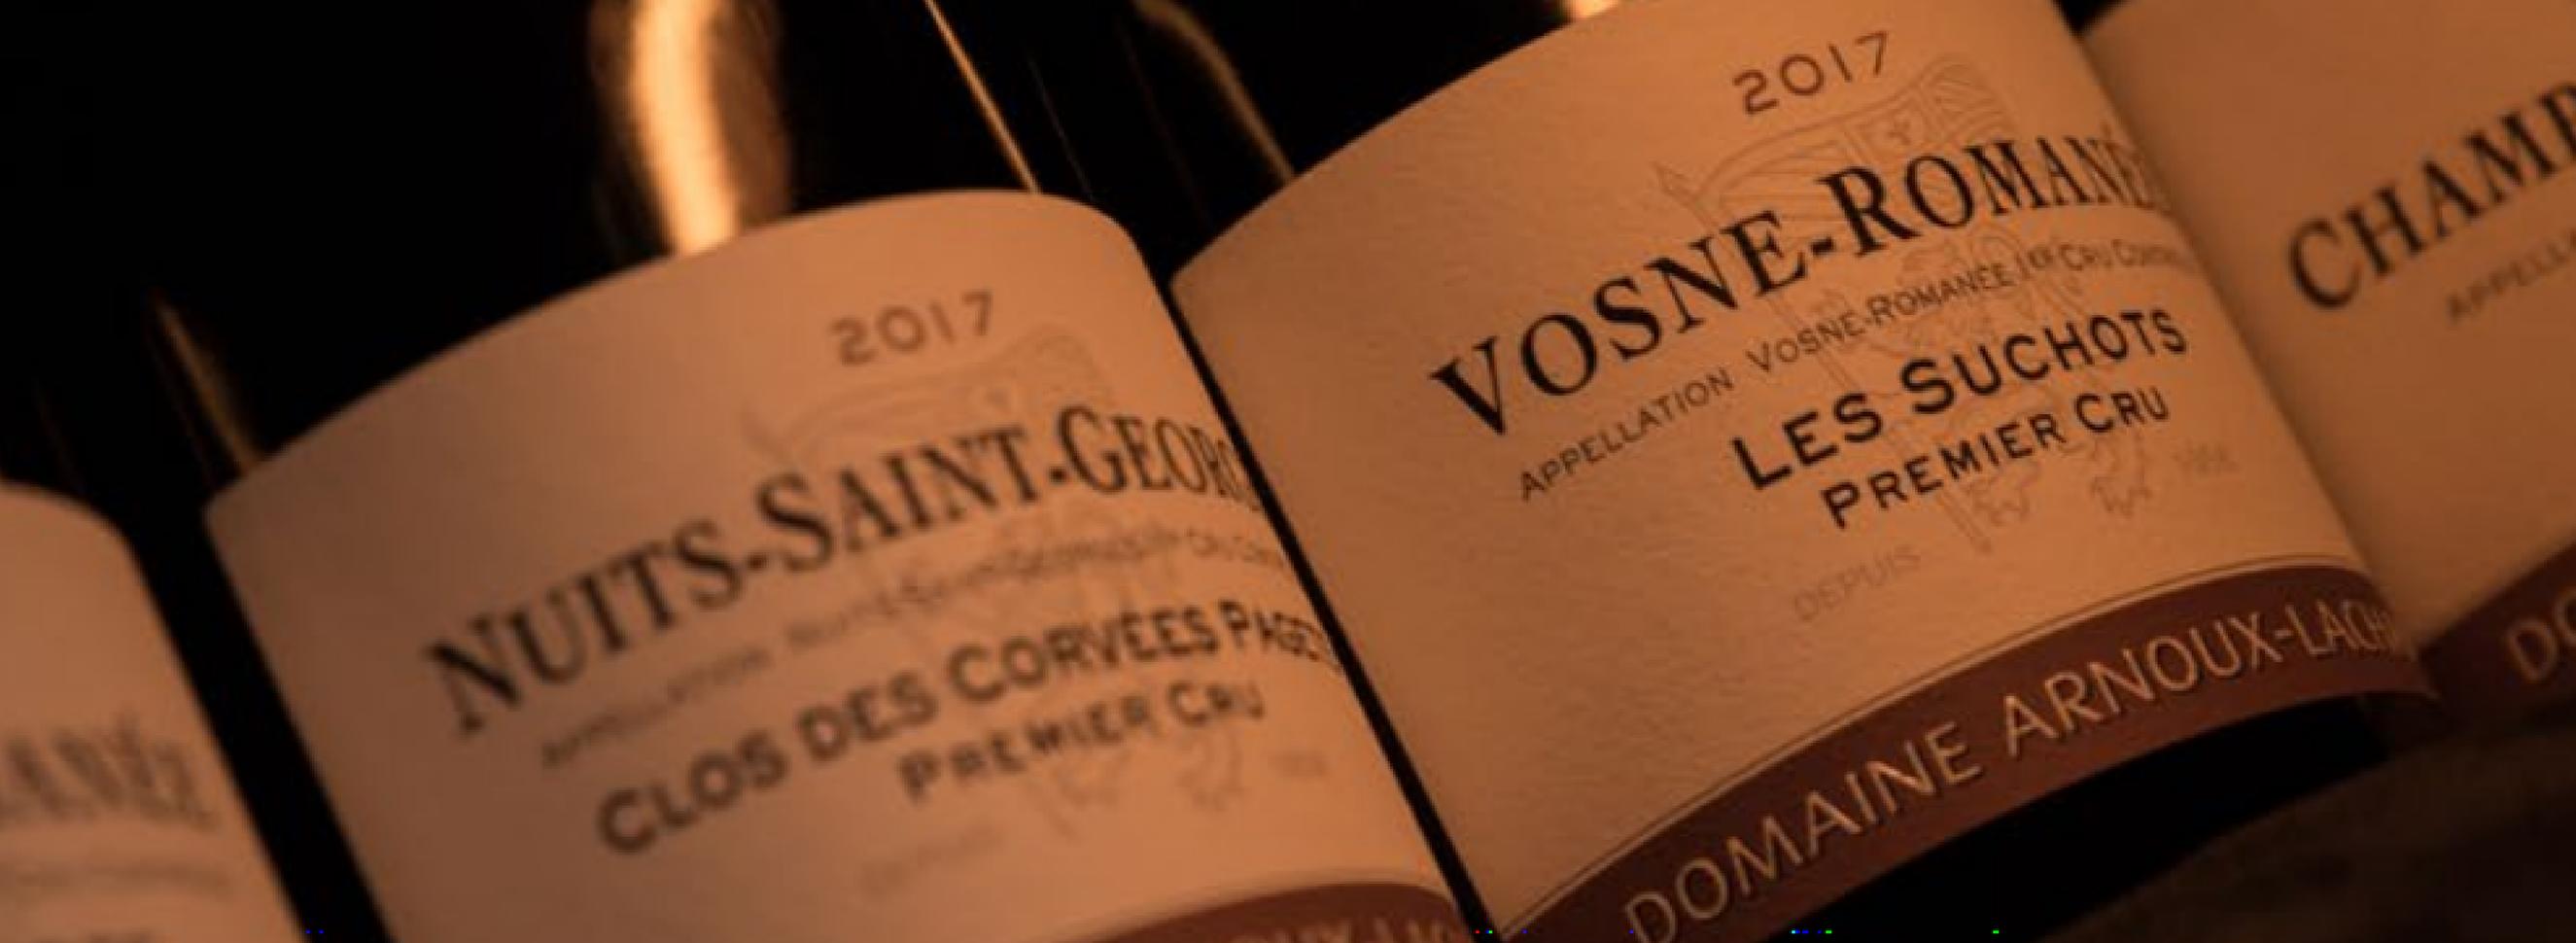 Domaine Arnoux-Lachaux: A year on